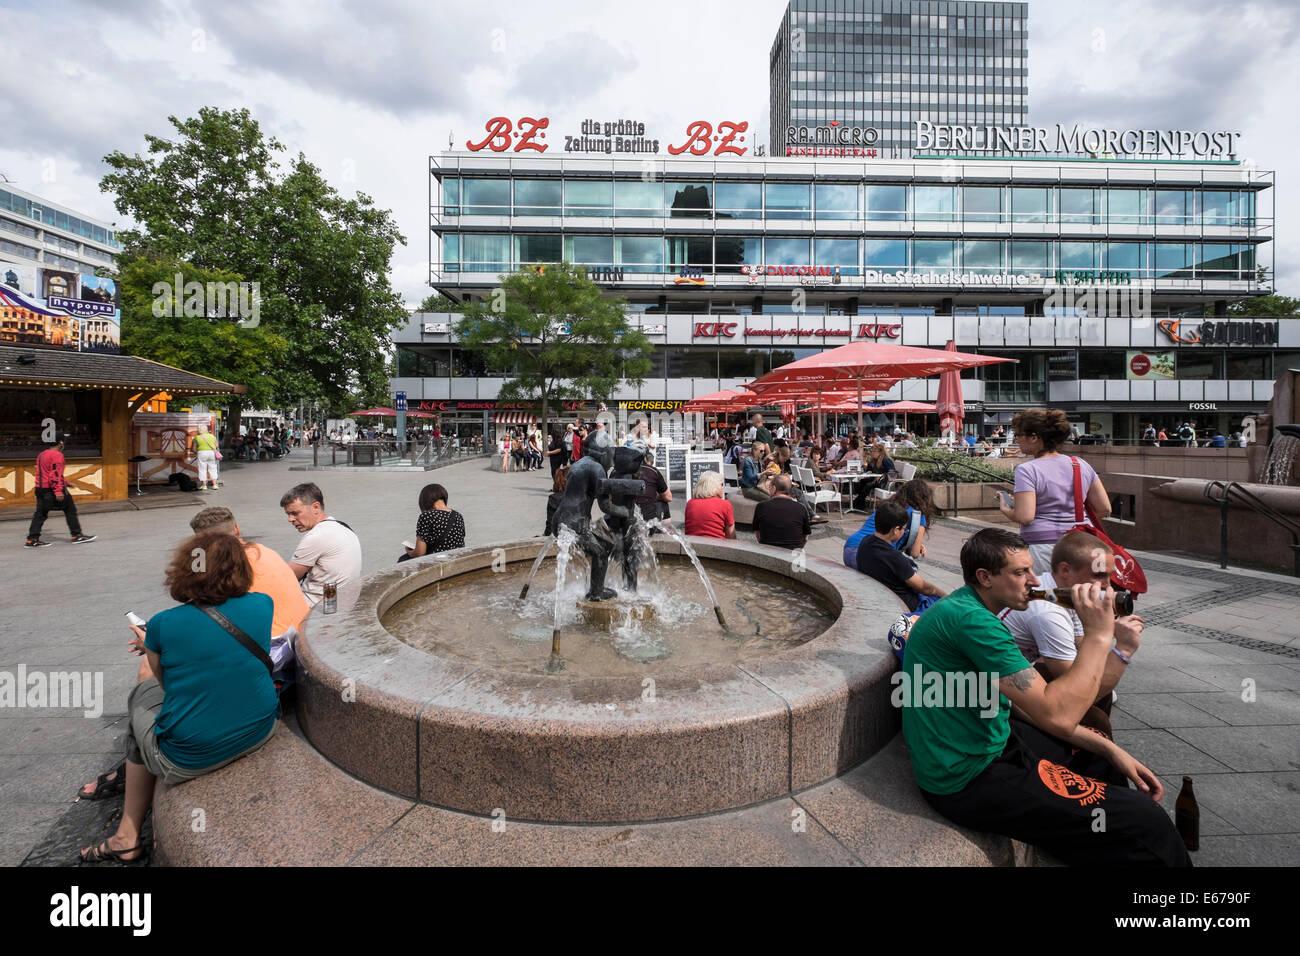 Le centre commercial Europa Center à Charlottenburg Berlin Allemagne Photo Stock